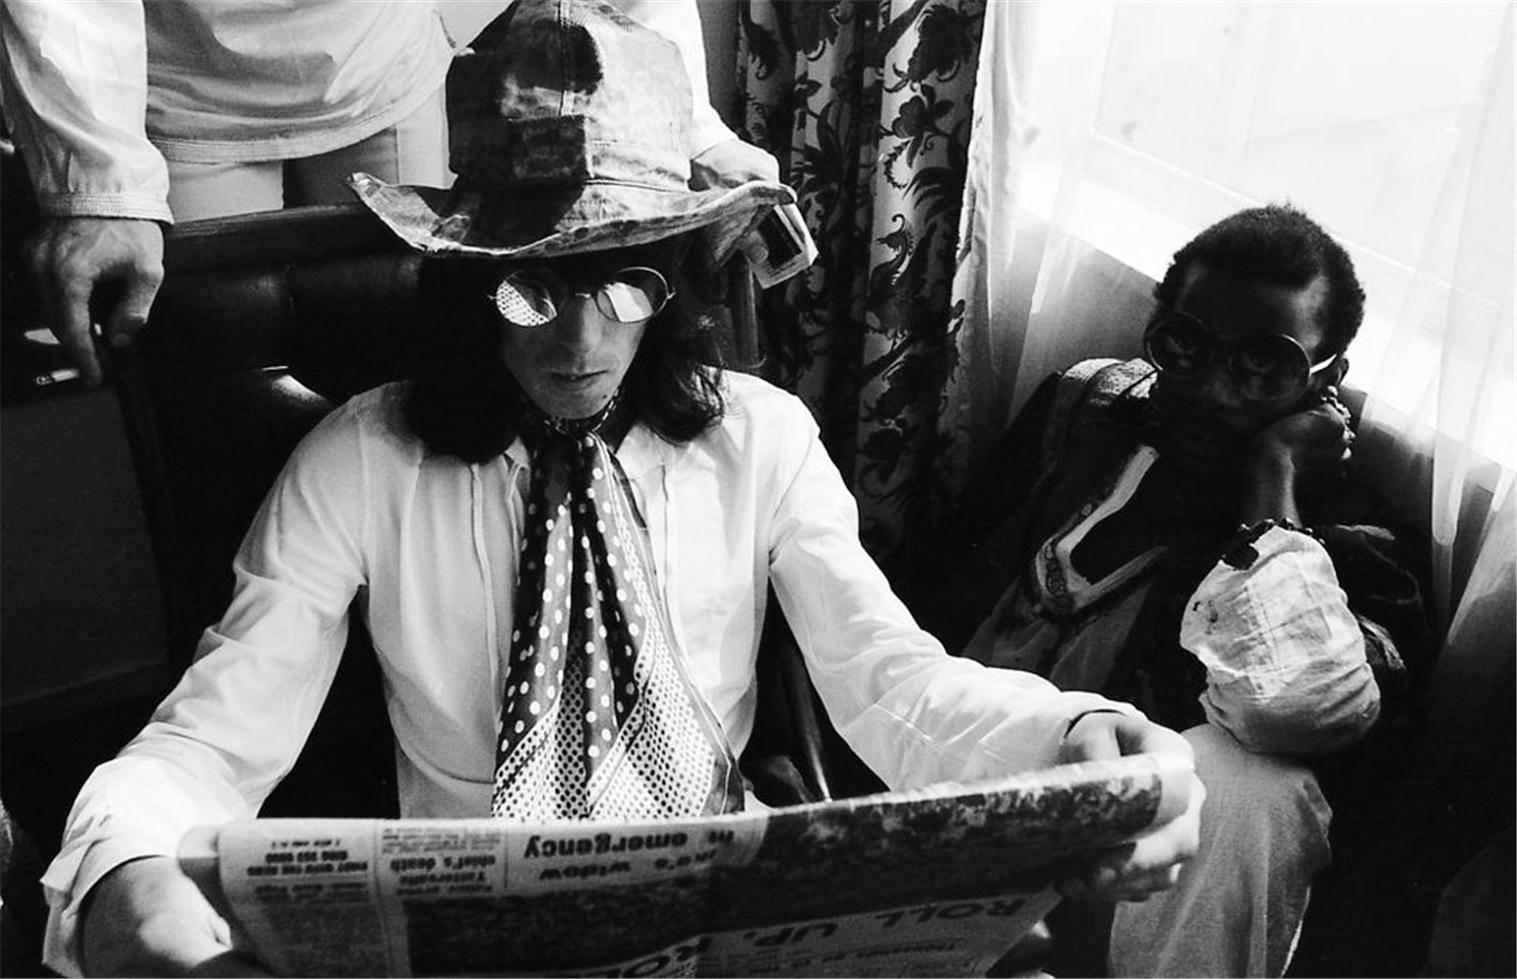 Keith Richards, 1967